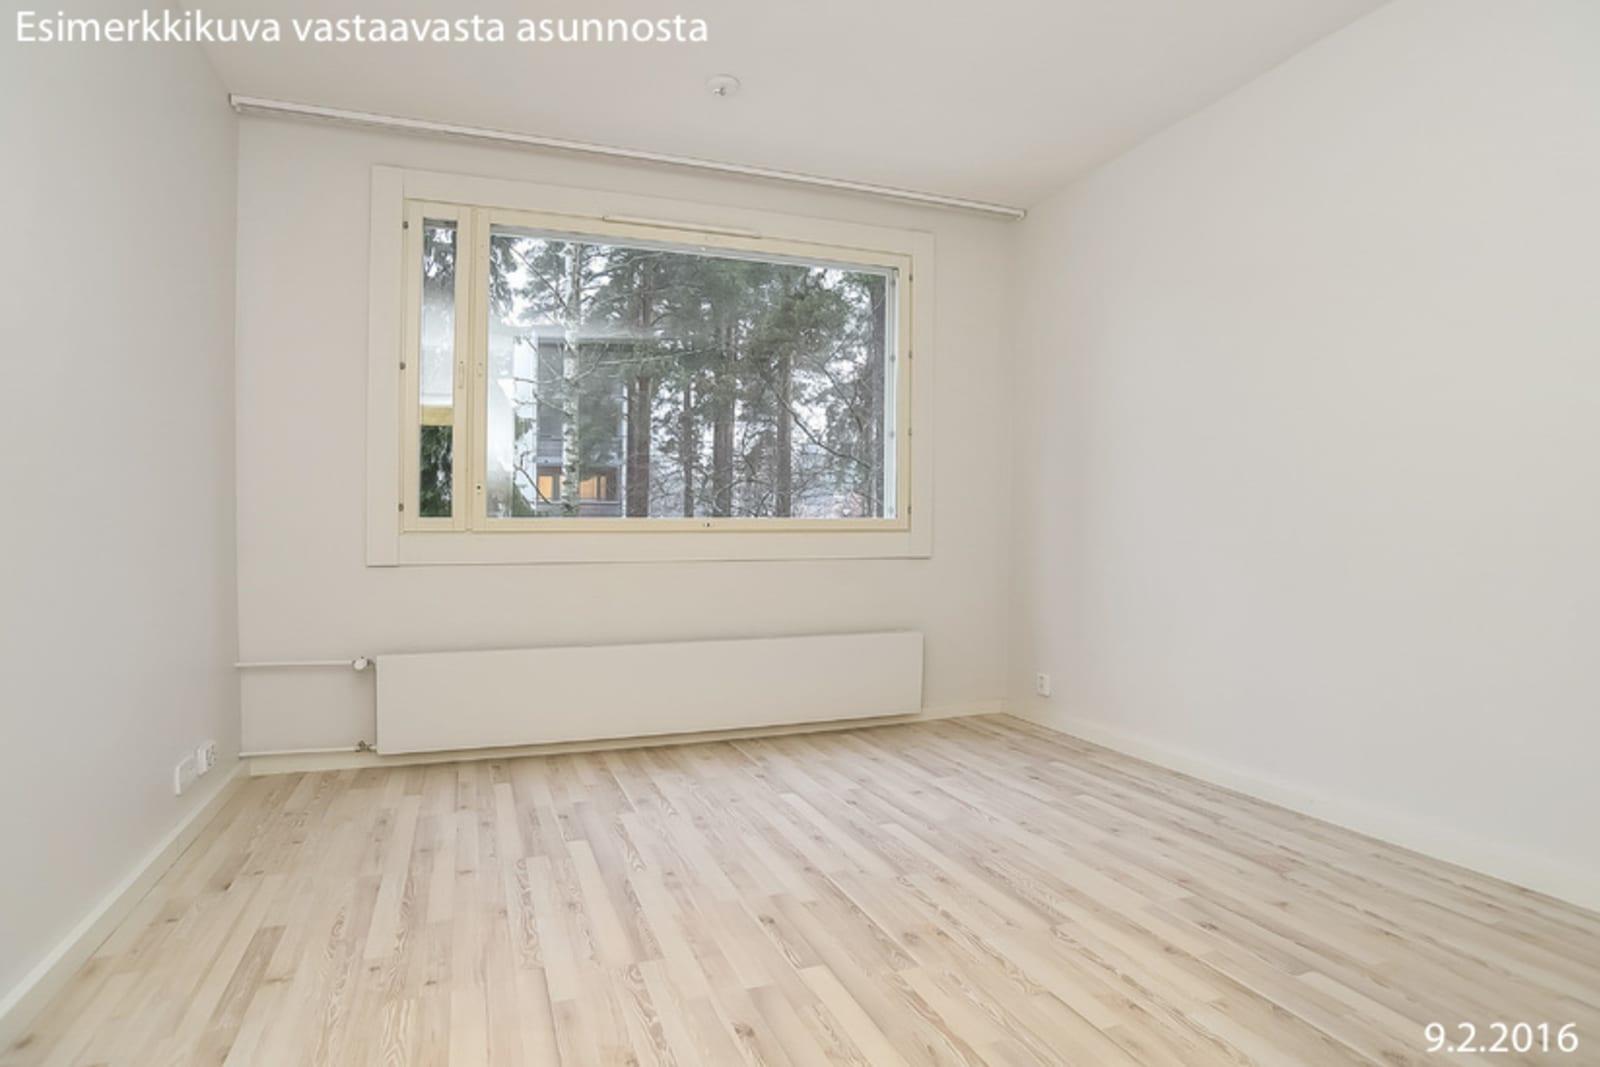 Espoo, Laajalahti, Heinjoenpolku 2 G-J H 052